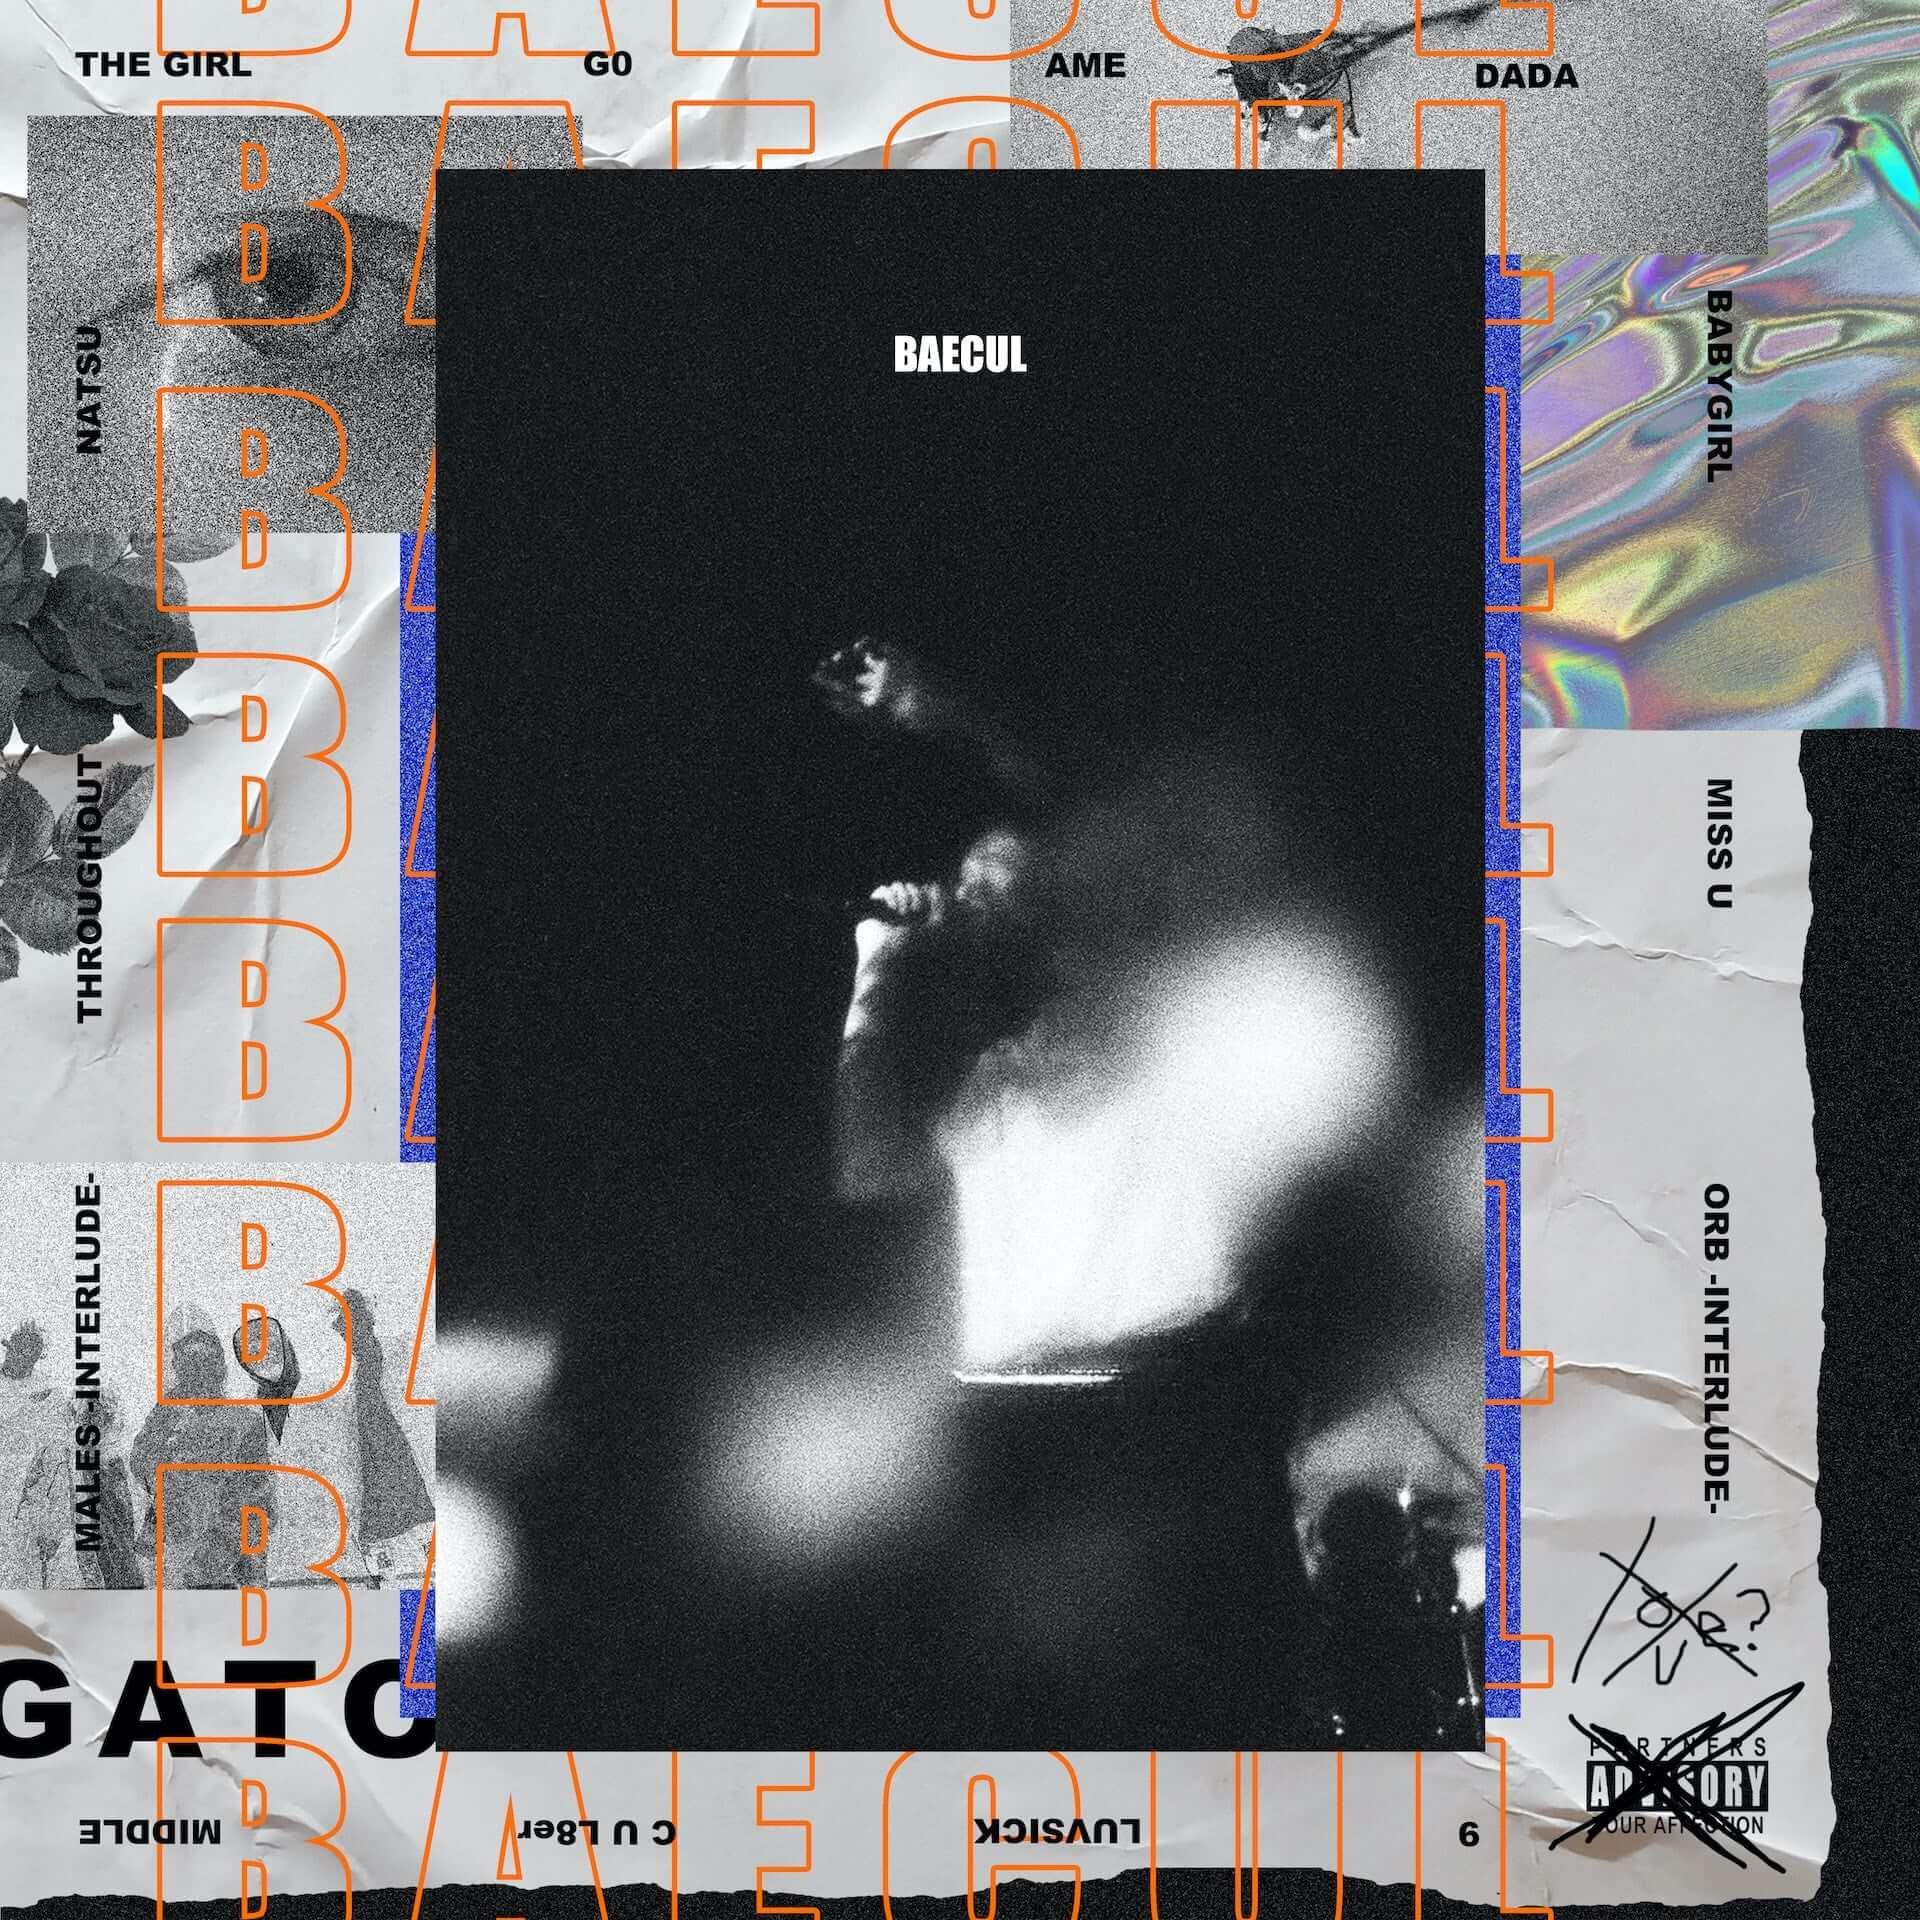 "gatoの最新シングル""dada""が配信開始&MVも公開!バンド初のフルアルバム『BAECUL』もリリース決定 music200903_gato_1-1920x1920"